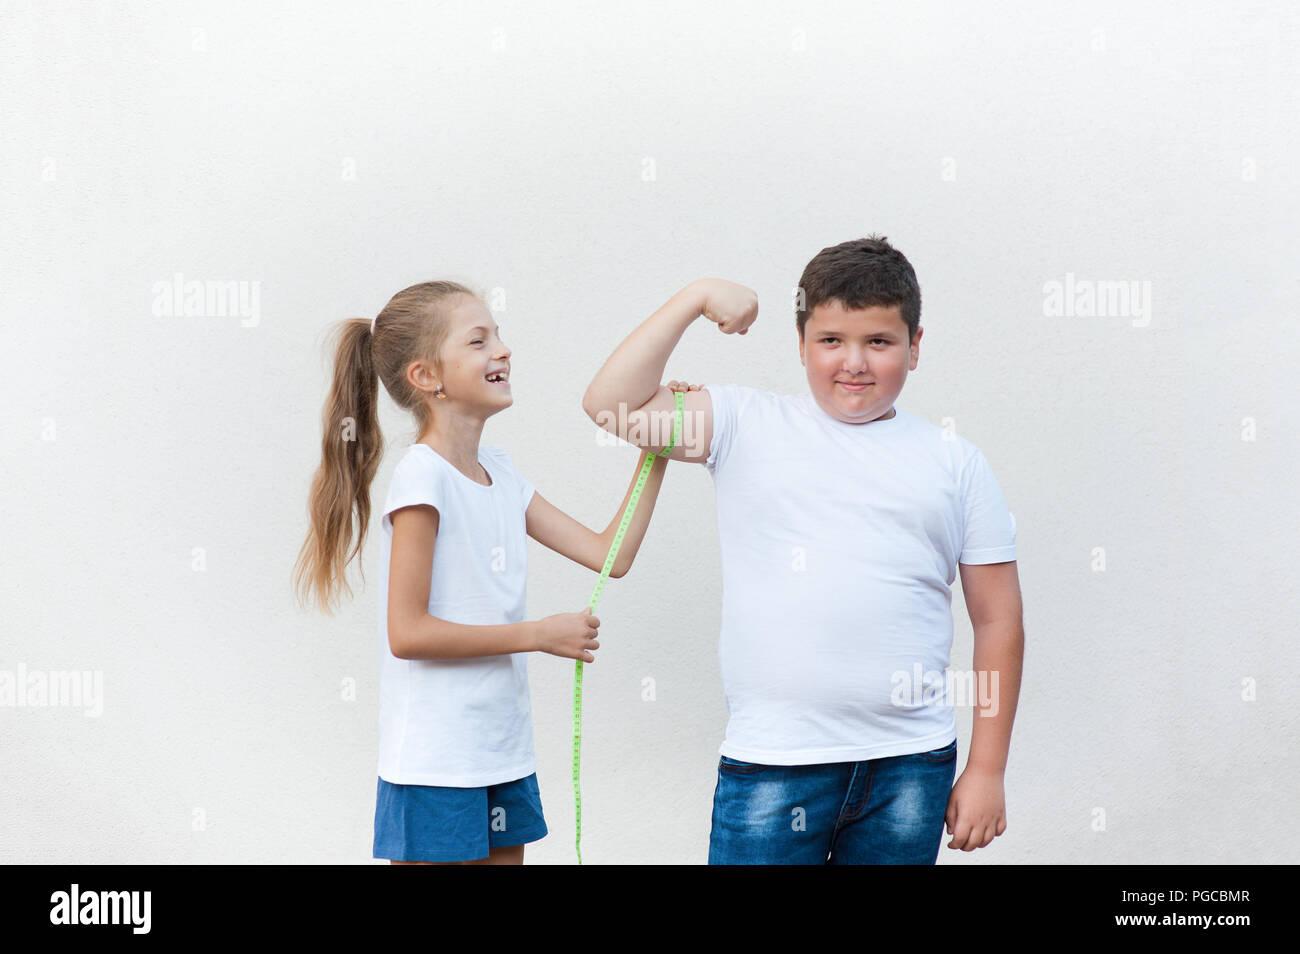 Bastante riendo caucásico niña sana delgado lindo medición Fat Boy músculo bíceps con cinta adhesiva. Imagen De Stock